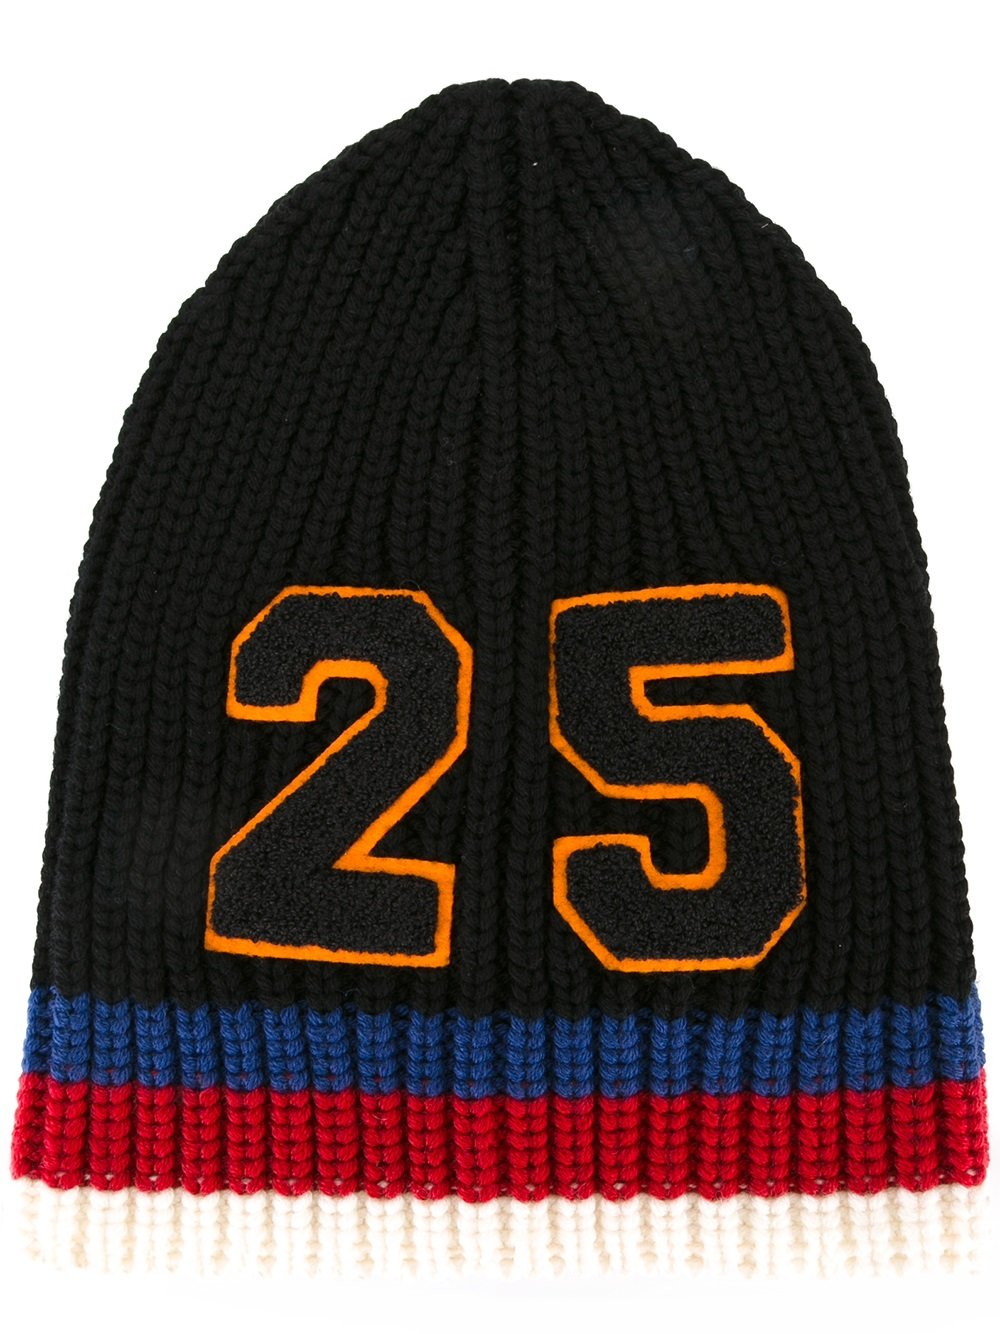 e9ce18dfd Gucci 25 ribbed knit beanie - Black - Glami.sk